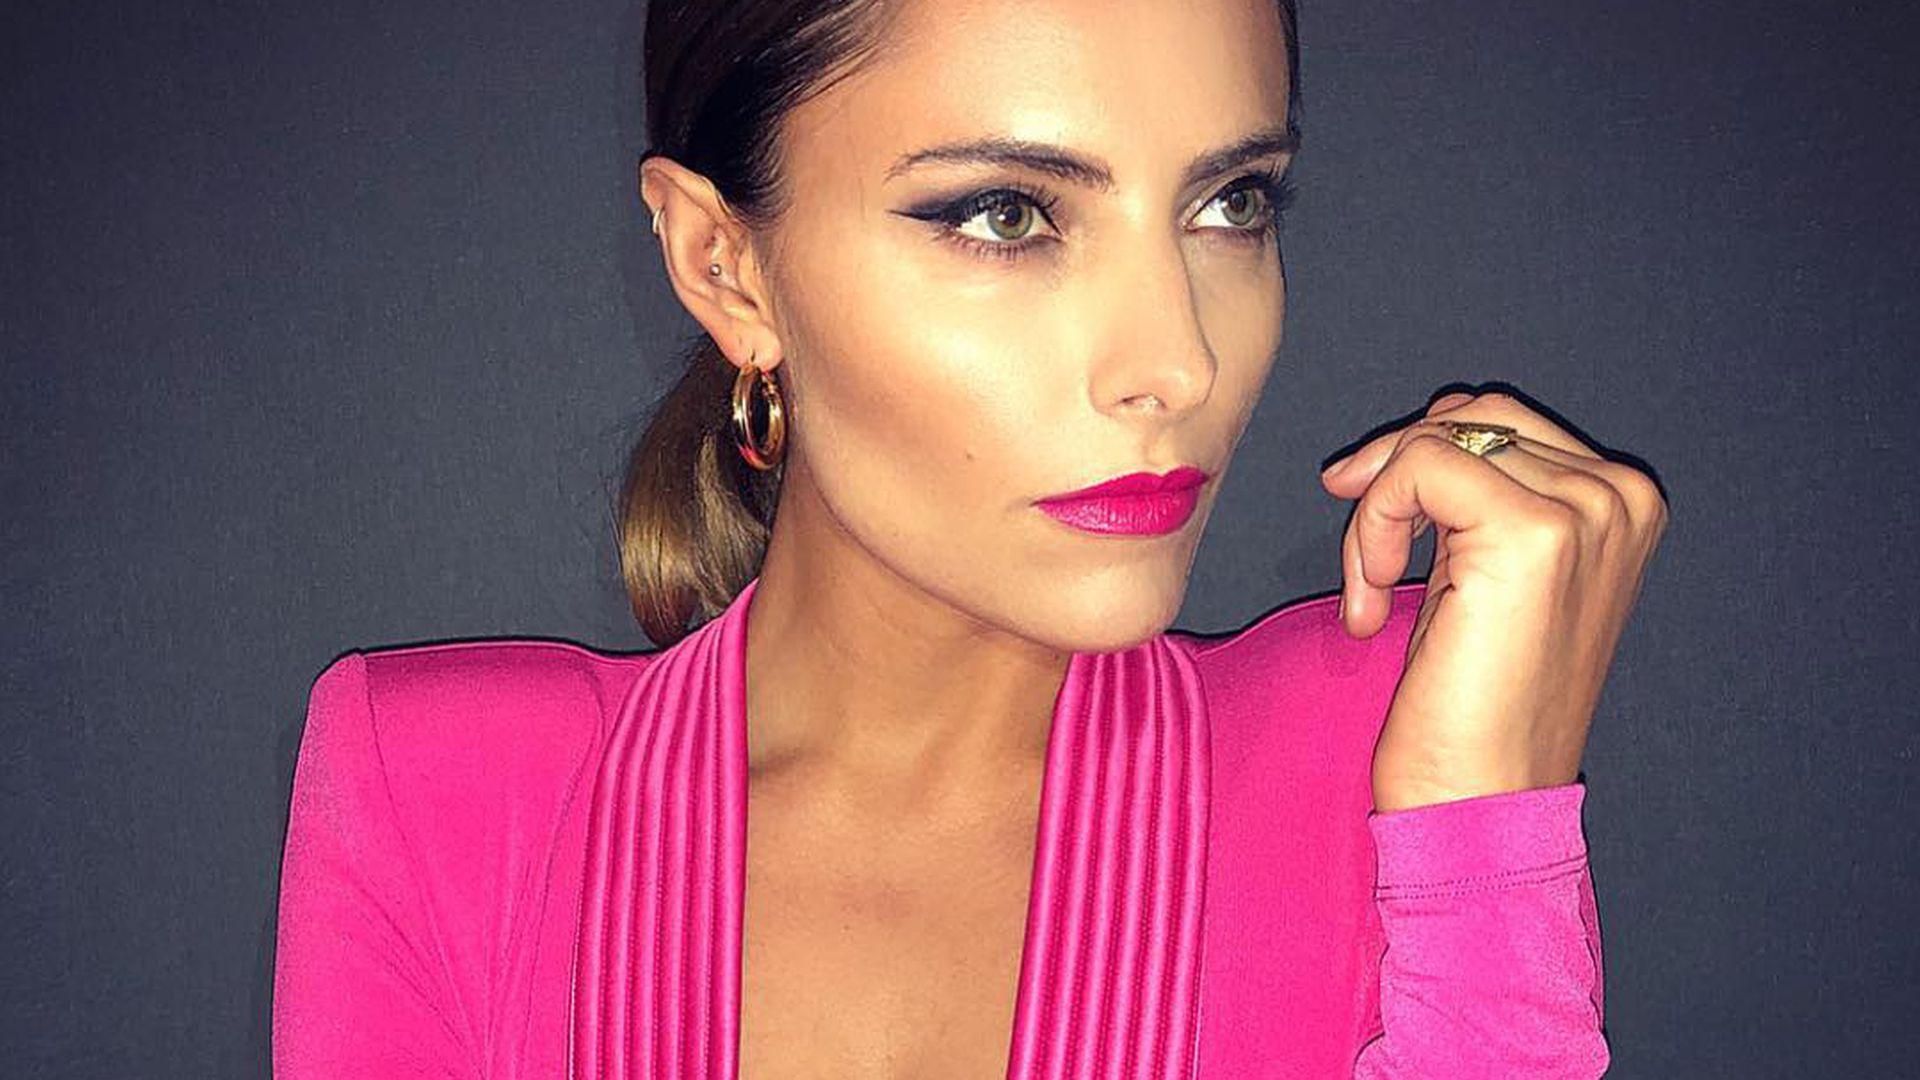 Sophia Thomalla Pics